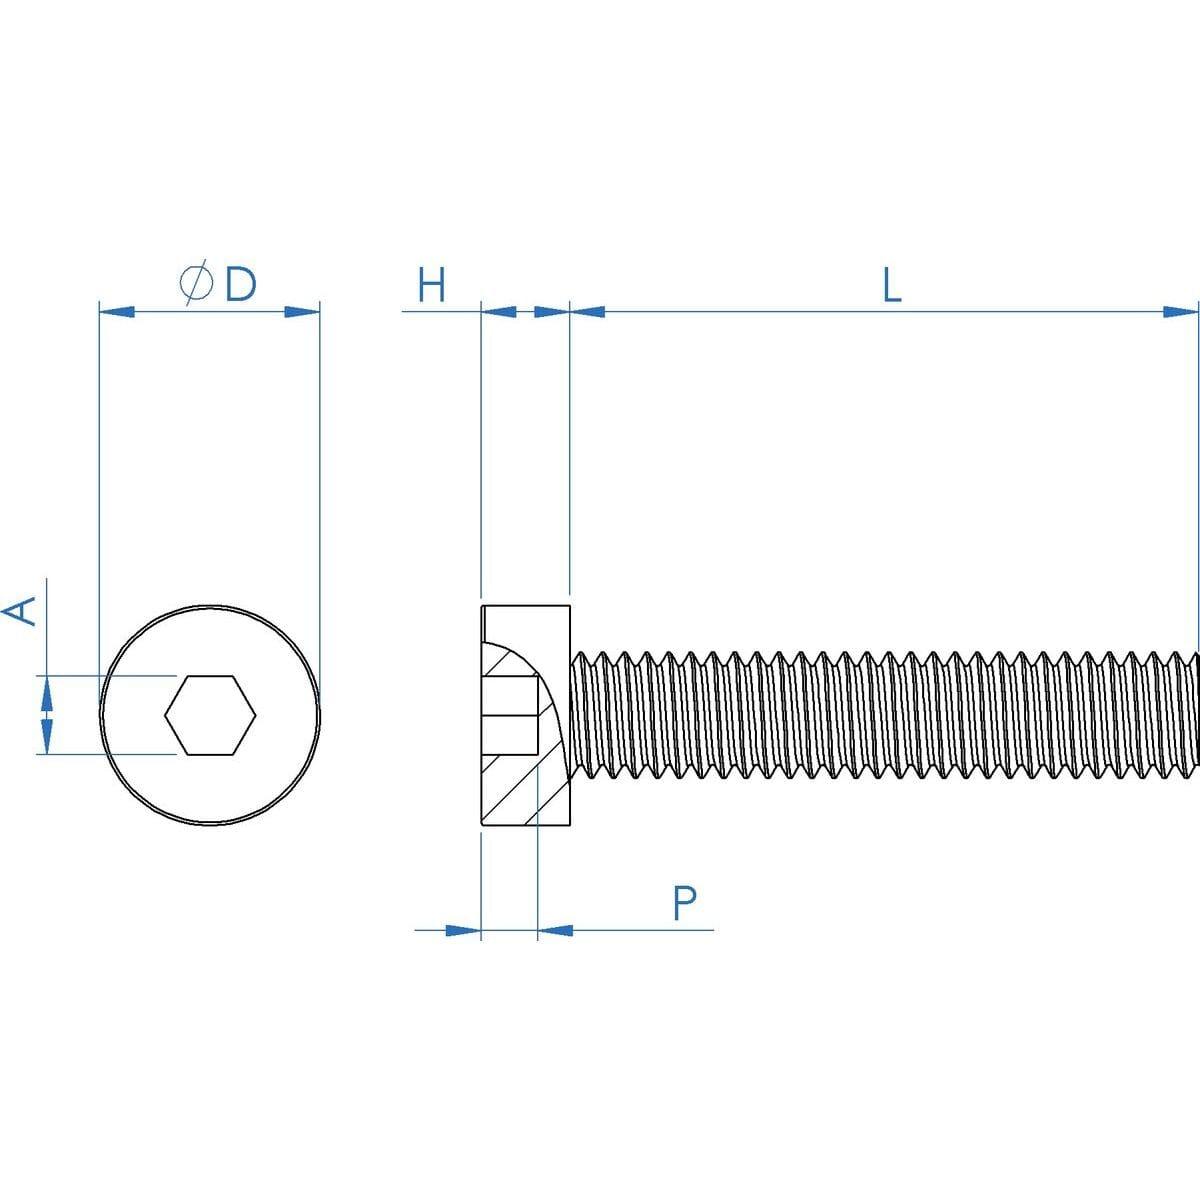 M8 x 20mm Low Head Pilot Recess Cap Screws (DIN 6912) - Stainless Steel (A2) Drawing